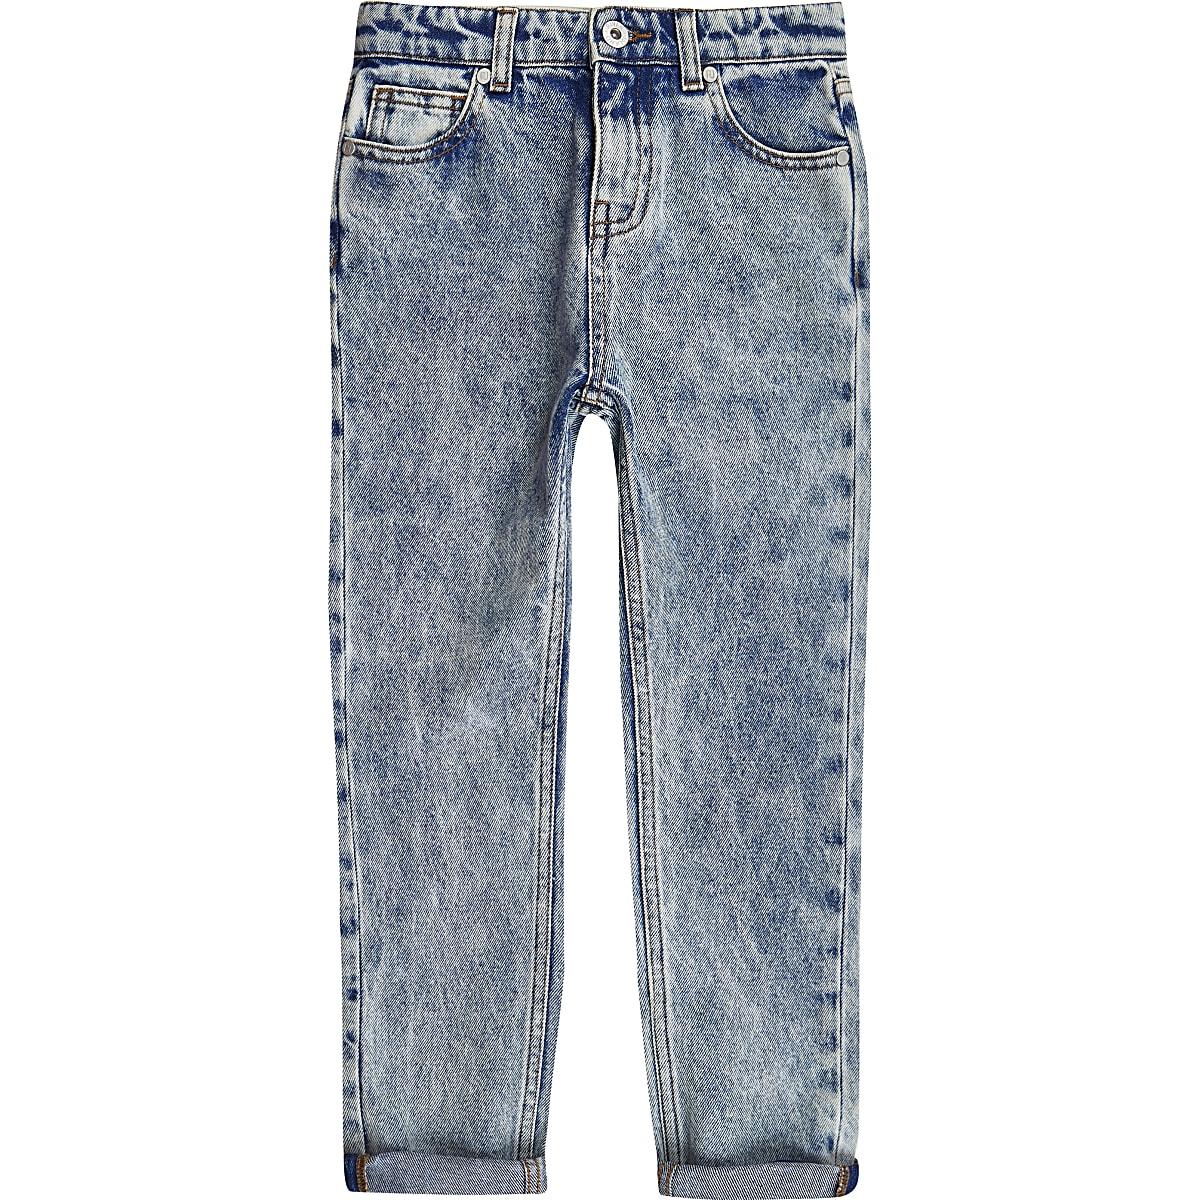 Boys RI Studio blue acid wash jeans